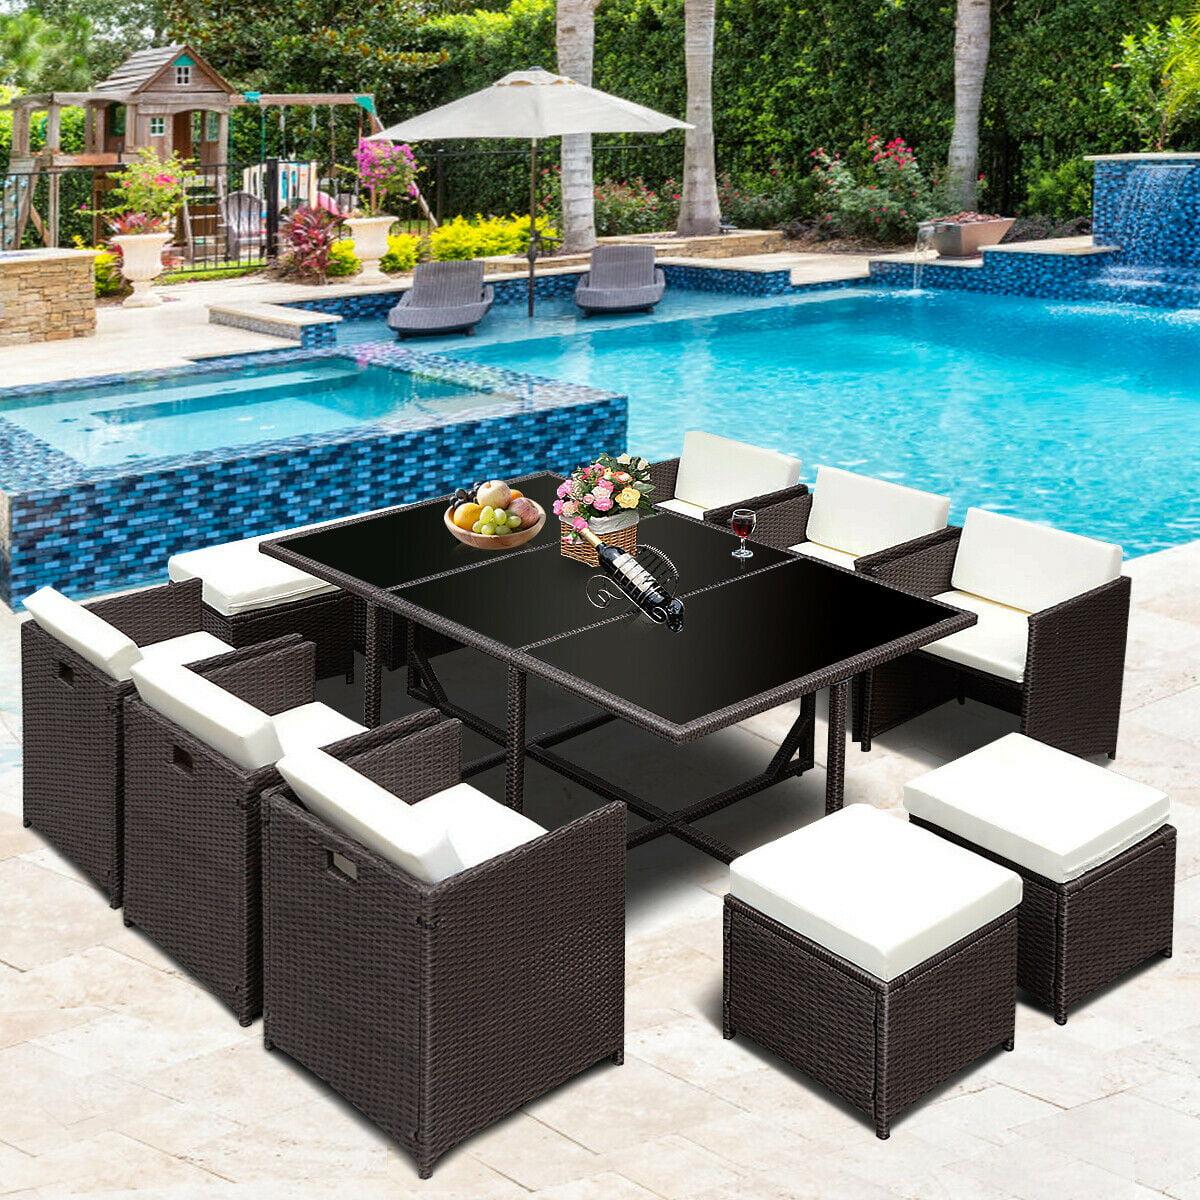 1a9317ee37e Costway 11 PCS Outdoor Patio Dining Set Metal Rattan Wicker Furniture Garden  Cushioned - Walmart.com